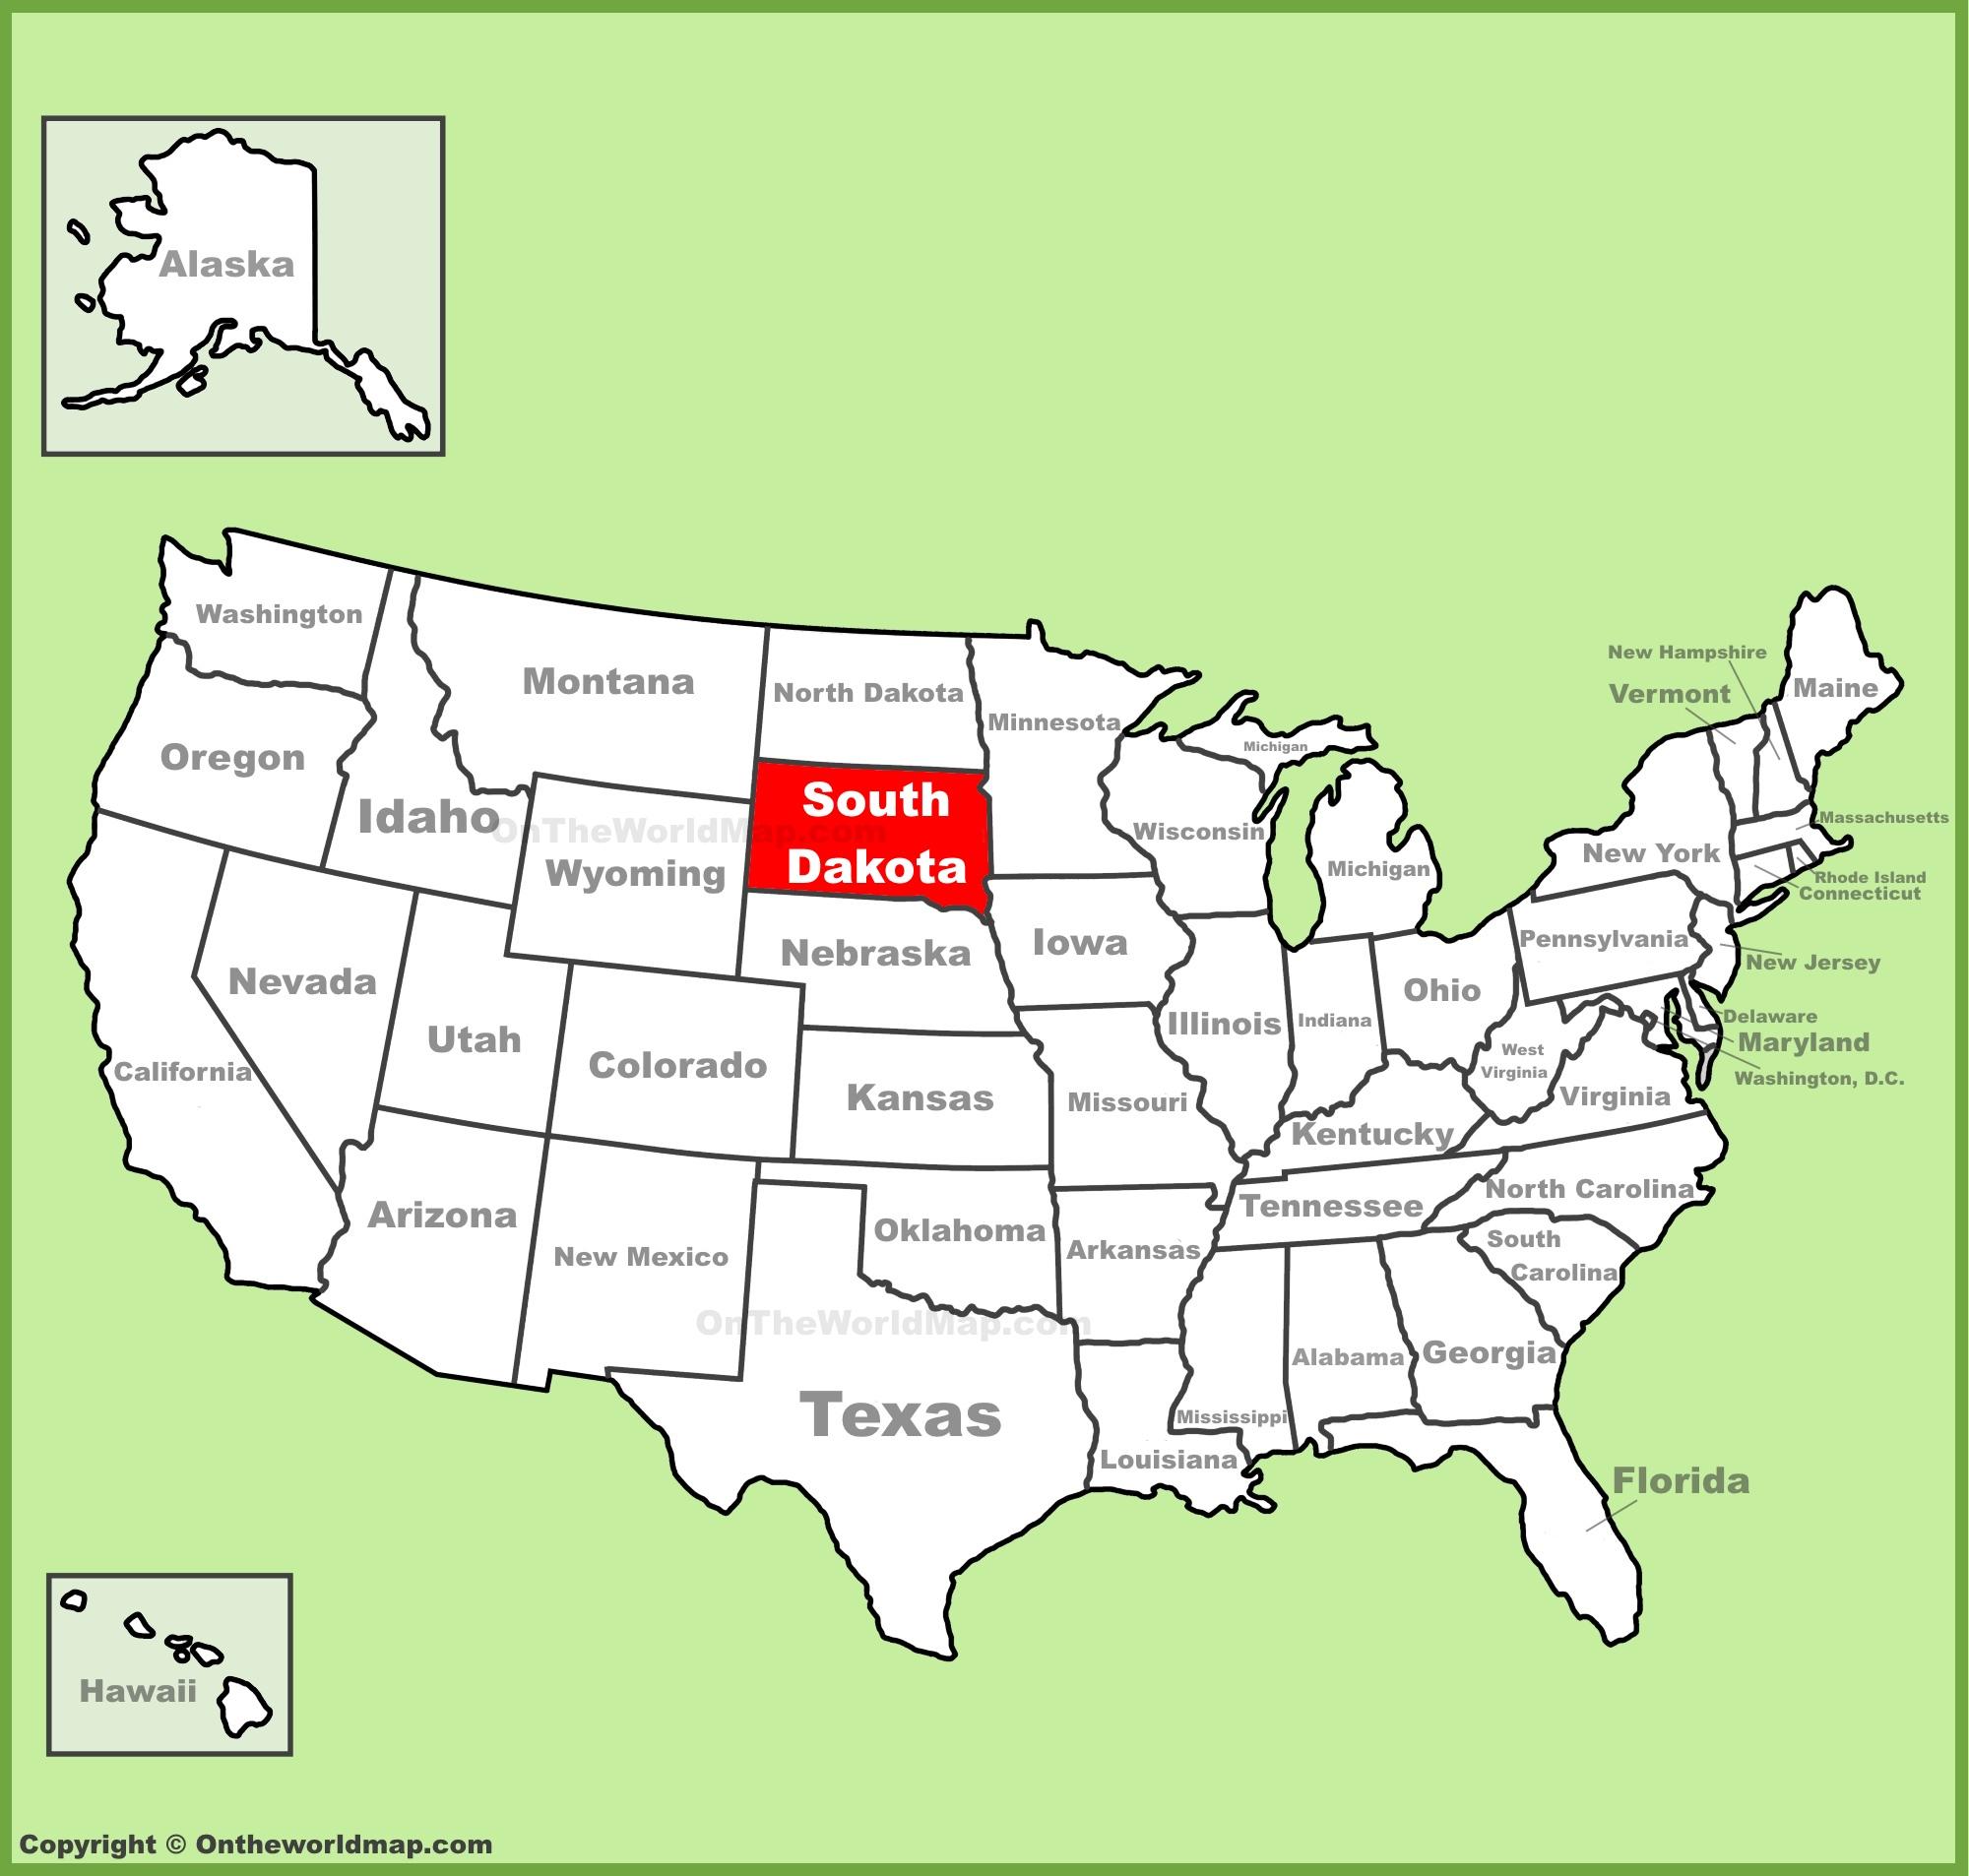 South Dakota Map South Dakota State Maps | USA | Maps of South Dakota (SD) South Dakota Map